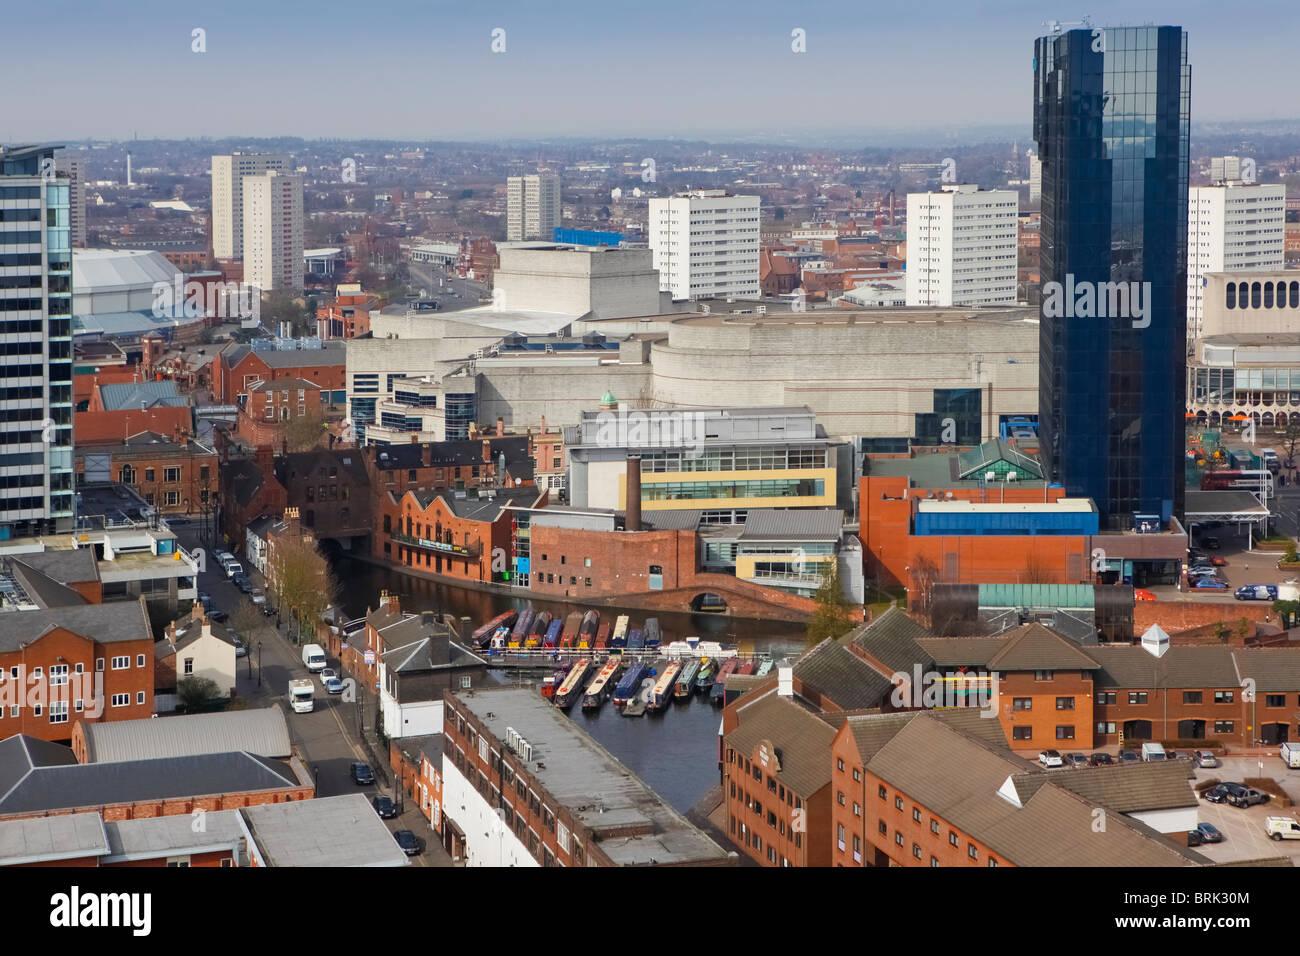 Broad Street, Gas St Basin, canal network, Hyatt hotel skyline of Birmingham, West Midlands, England, UK - Stock Image